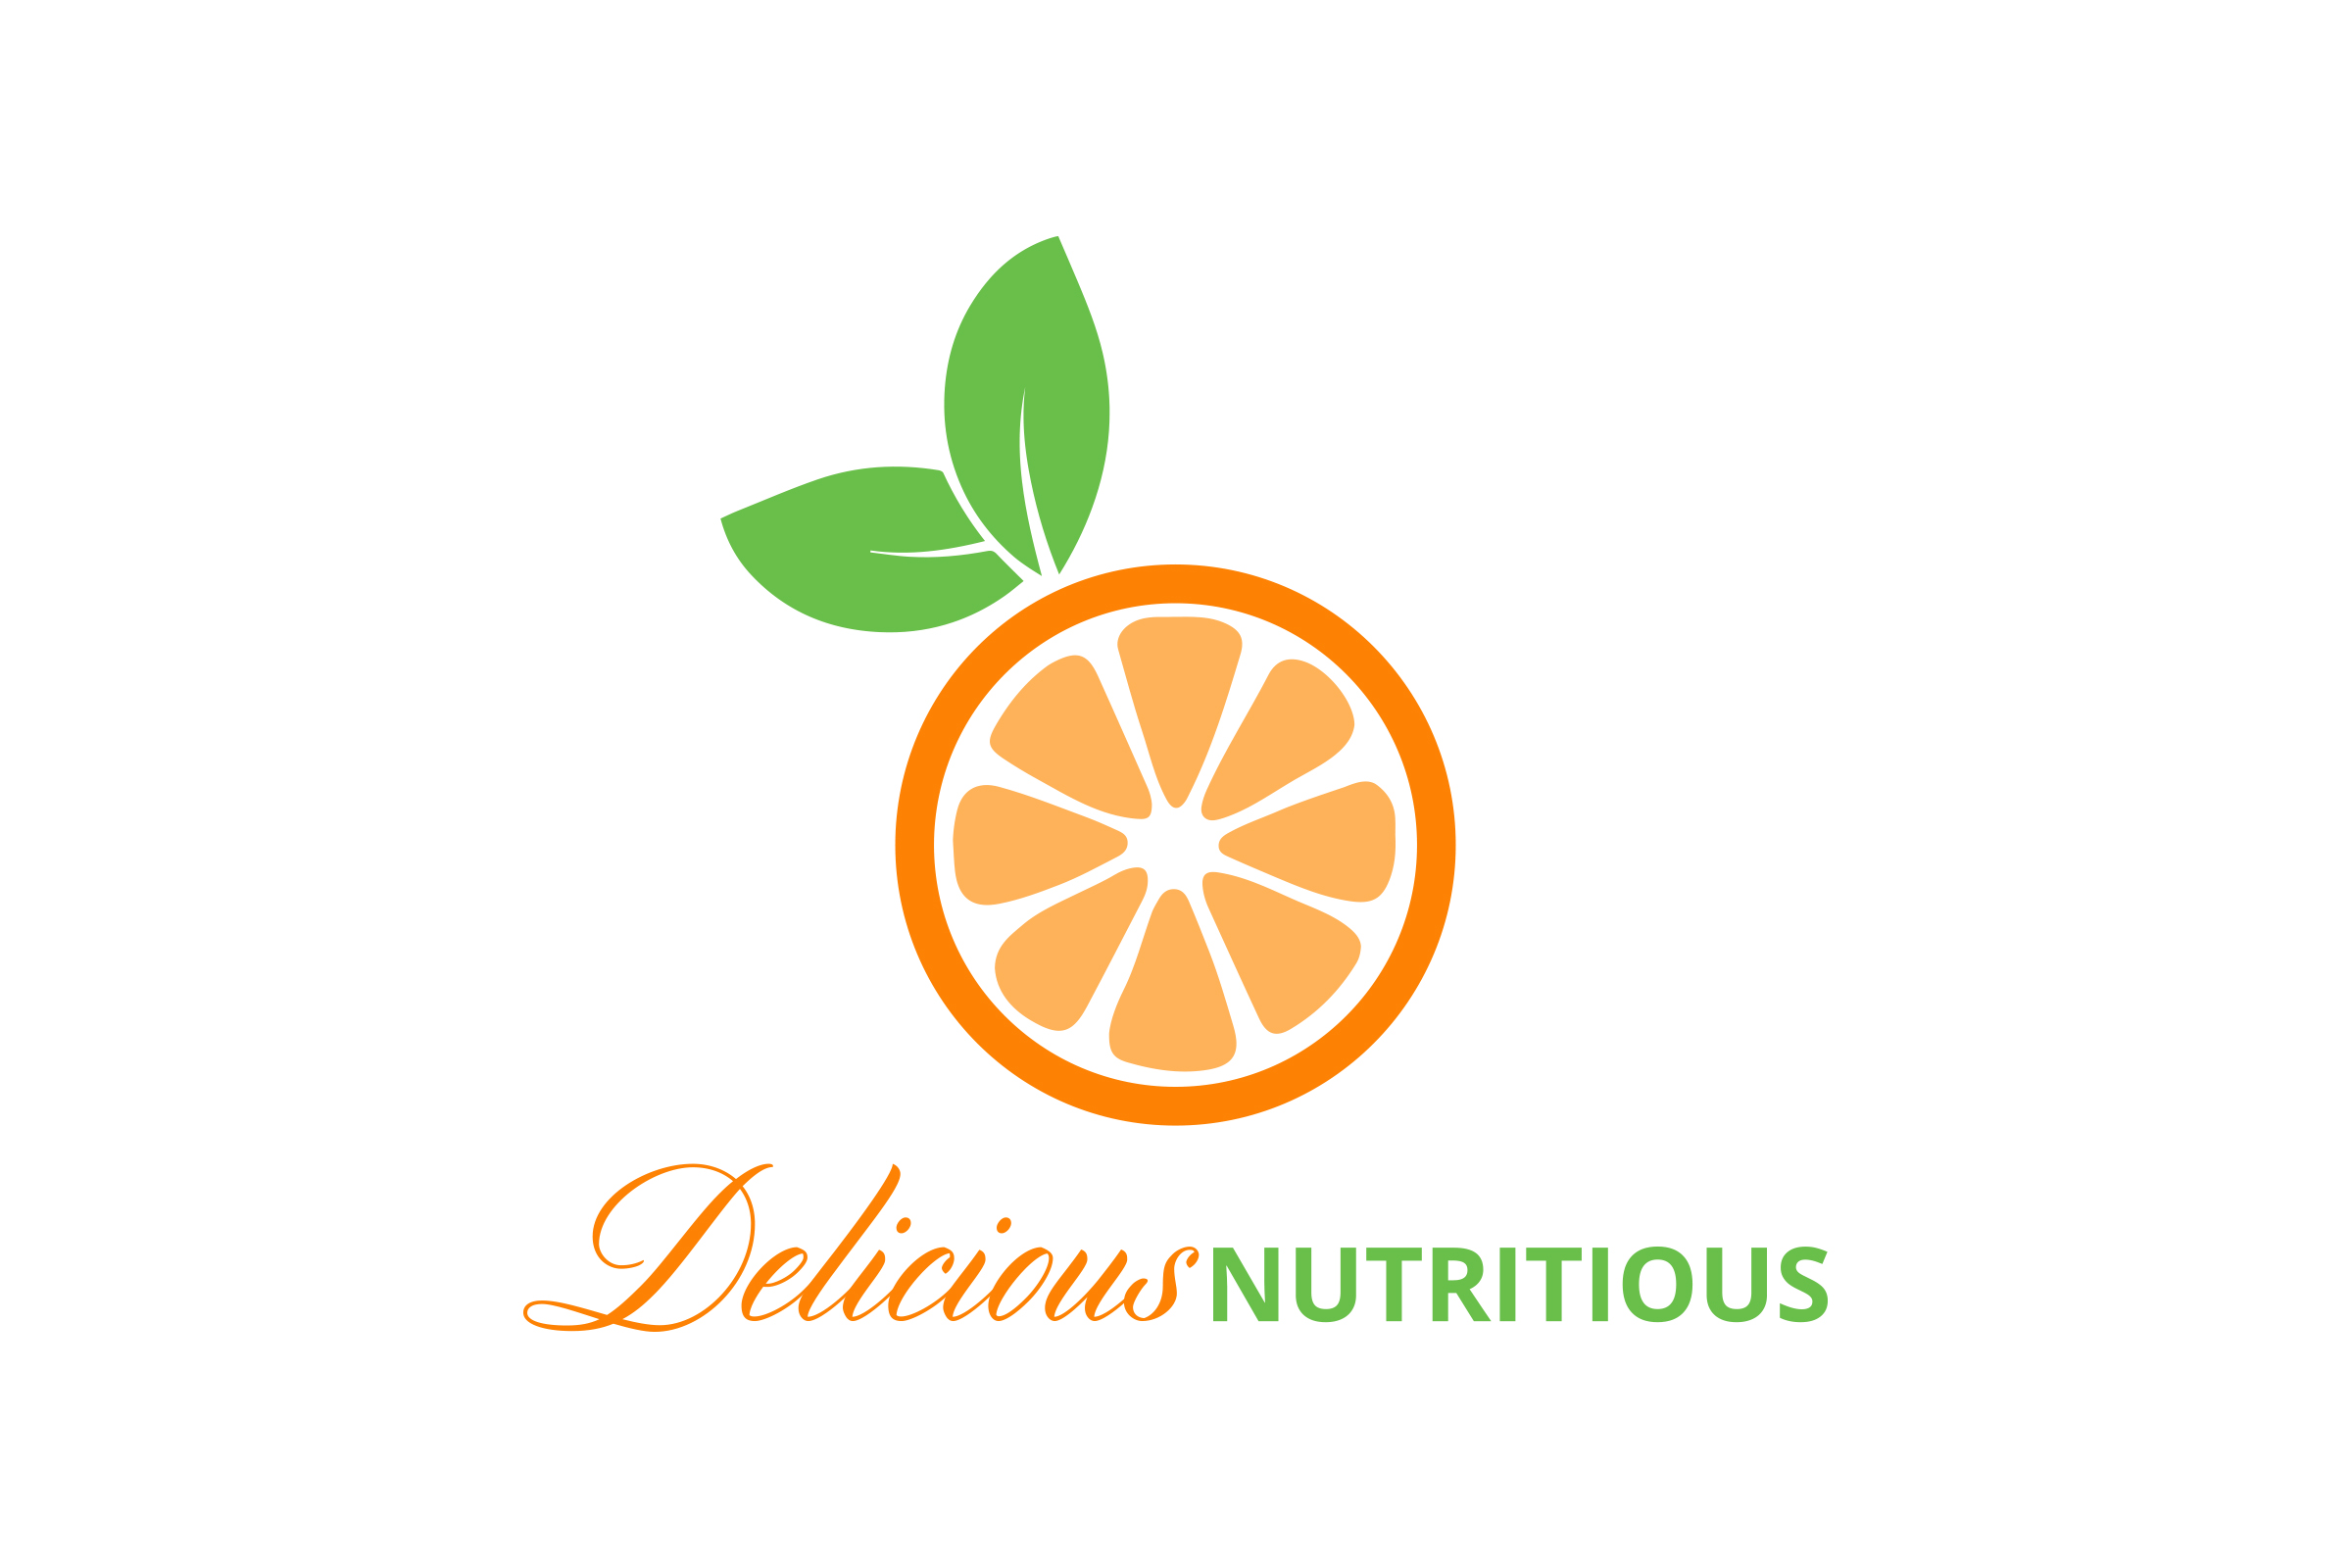 hearthfire-creative-logo-brand-identity-designer-denver-colorado-delicious-nutritious-2.jpg